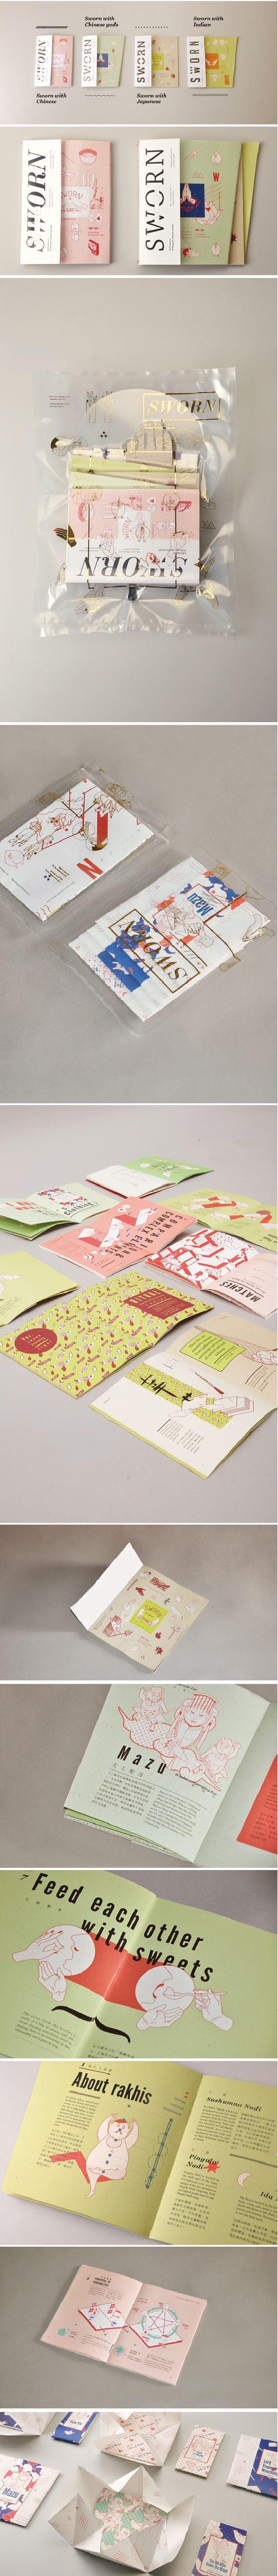 SWORN \ Editorial Design, Graphic Design, Illustration \ youwen cao \ Taipei, Taiwan: